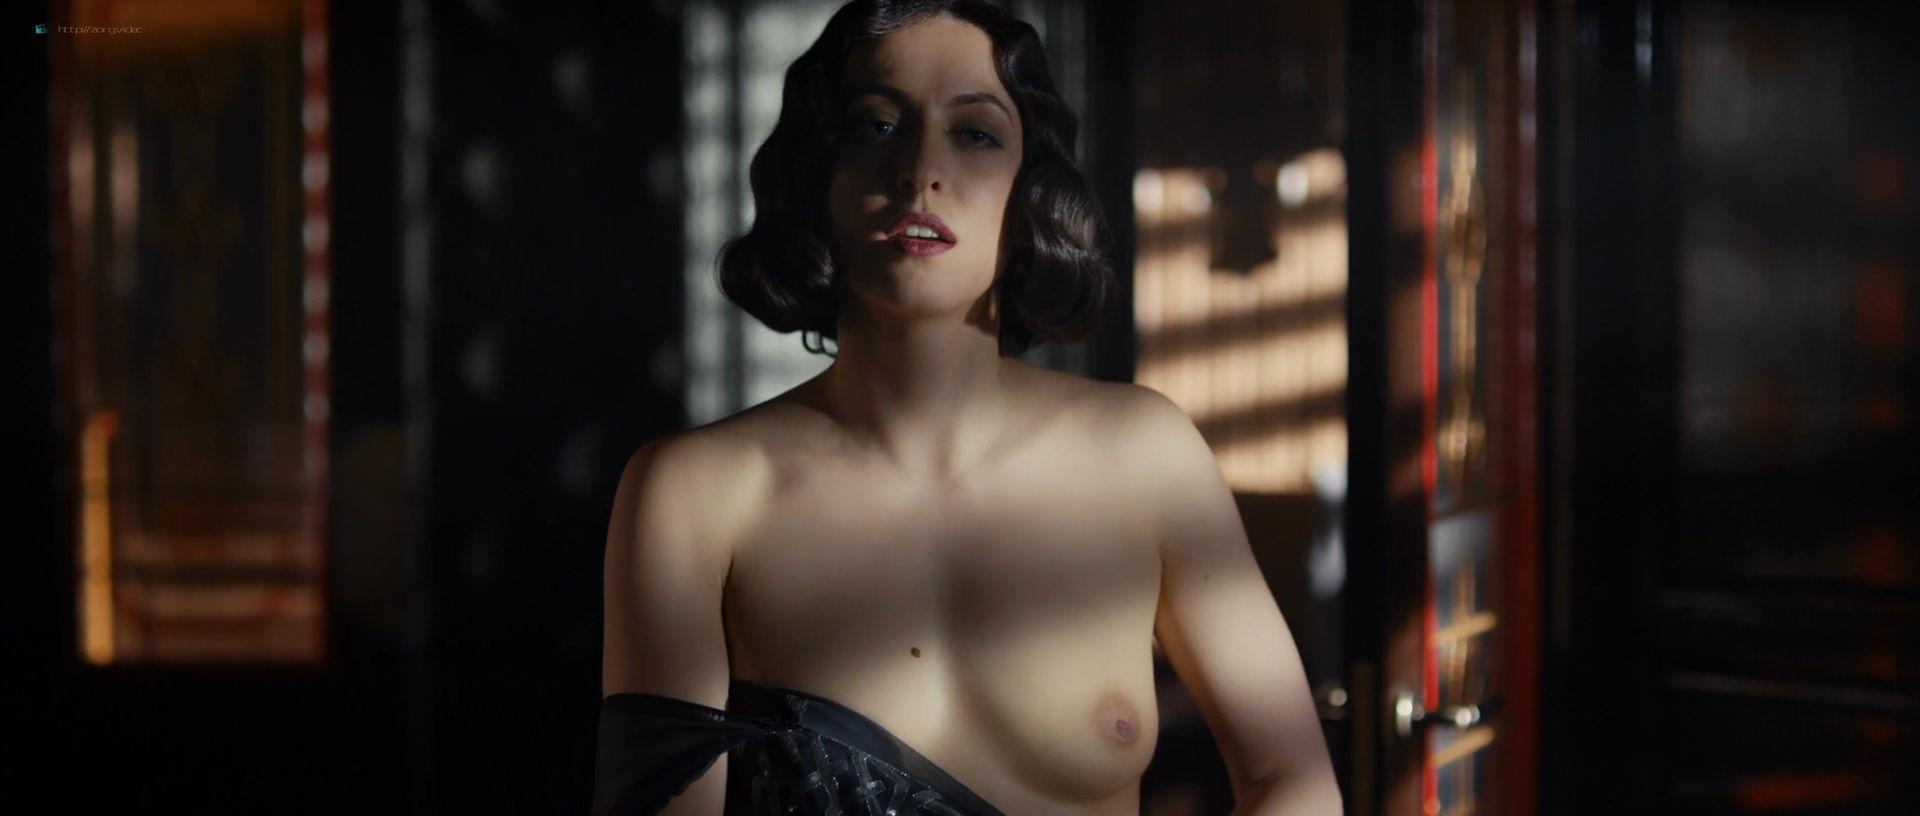 Anastasiya Meskova nude full frontal Olga Sutulova nude sex - Trotsky (2017) s1e1-2 HD 1080p (15)